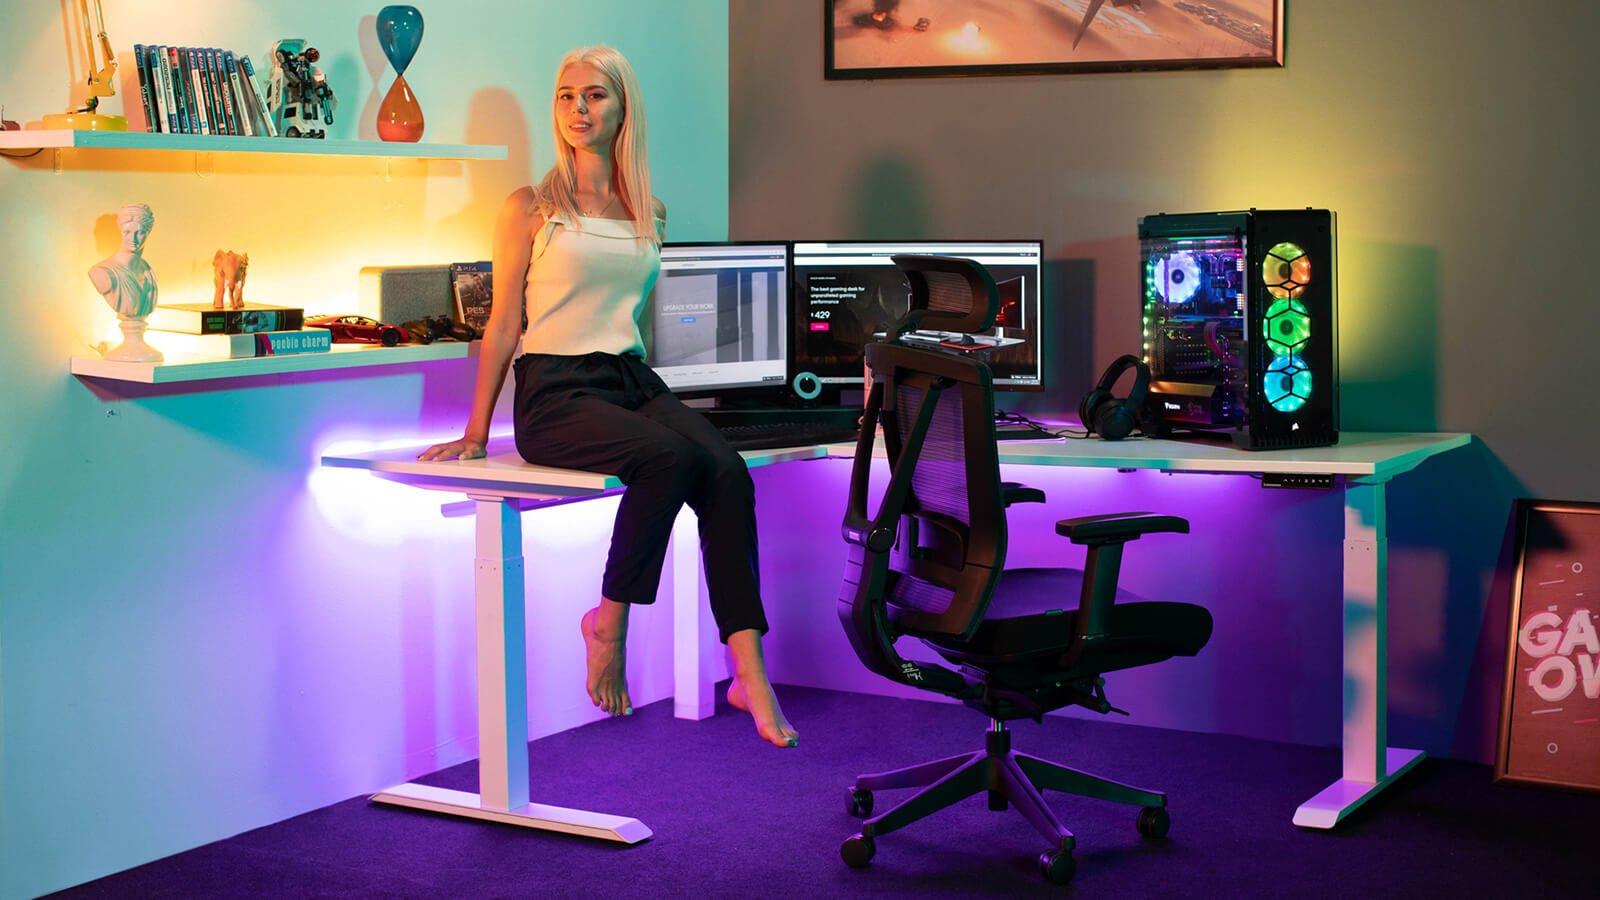 The professional streamer set